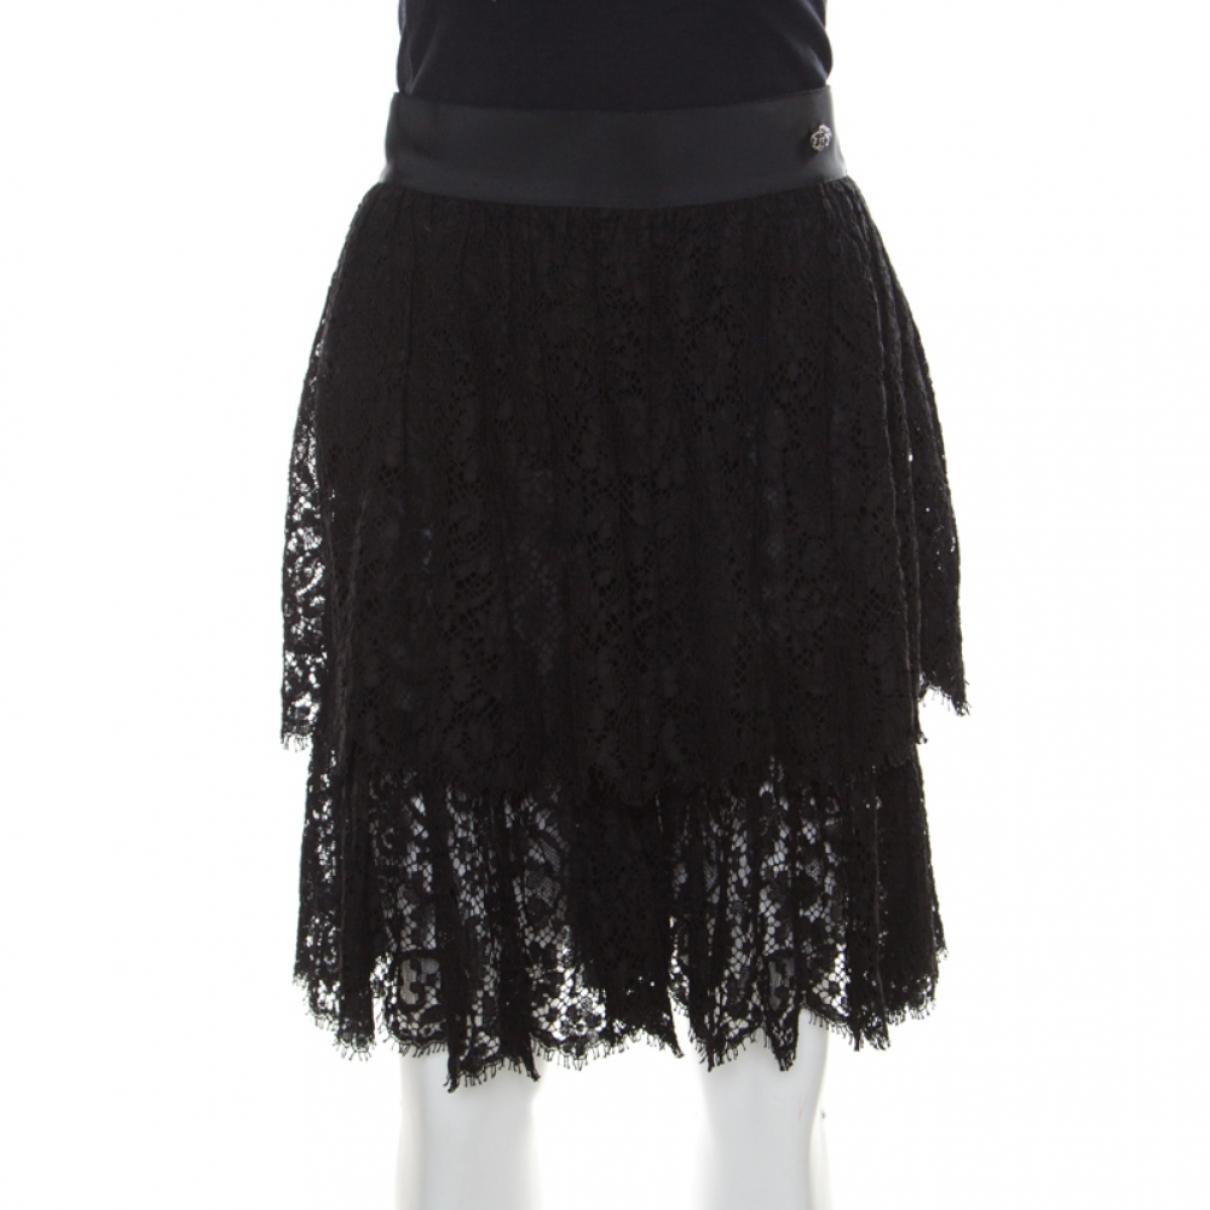 Chanel \N Black Cotton Shorts for Women S International